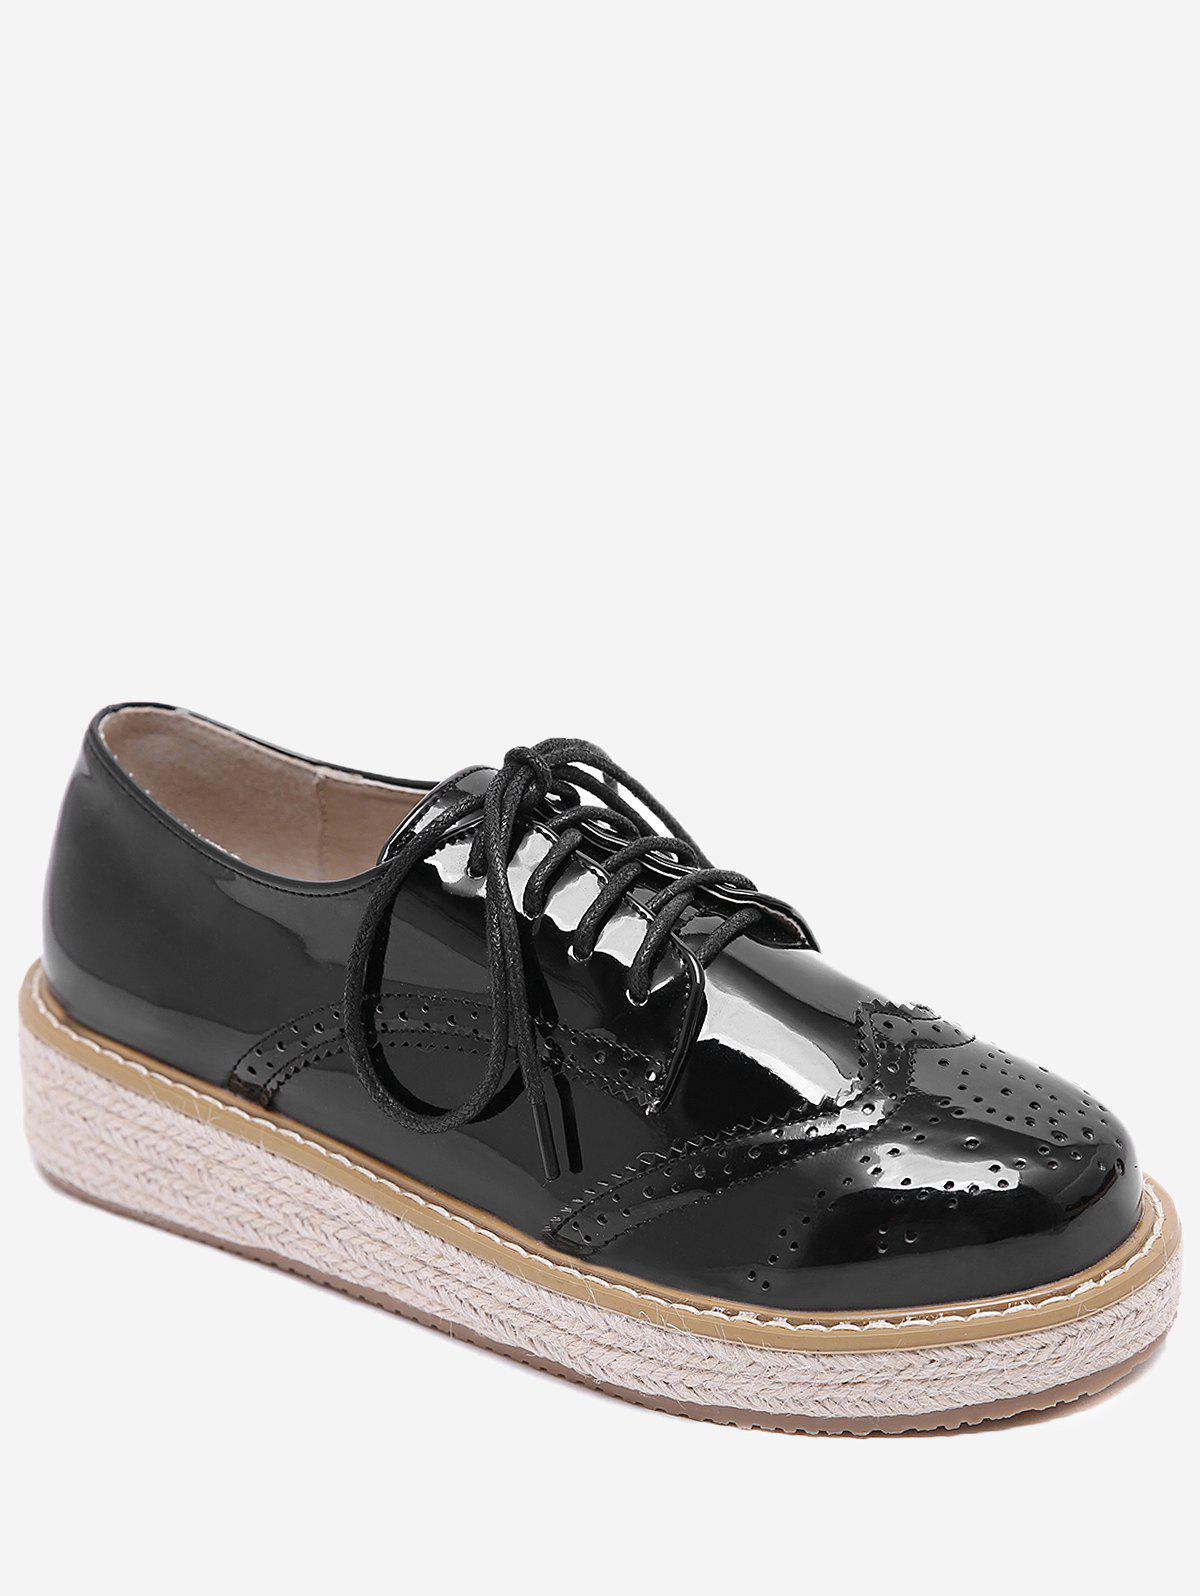 Brevet Cuir Espadrilles De Couture Sneakers